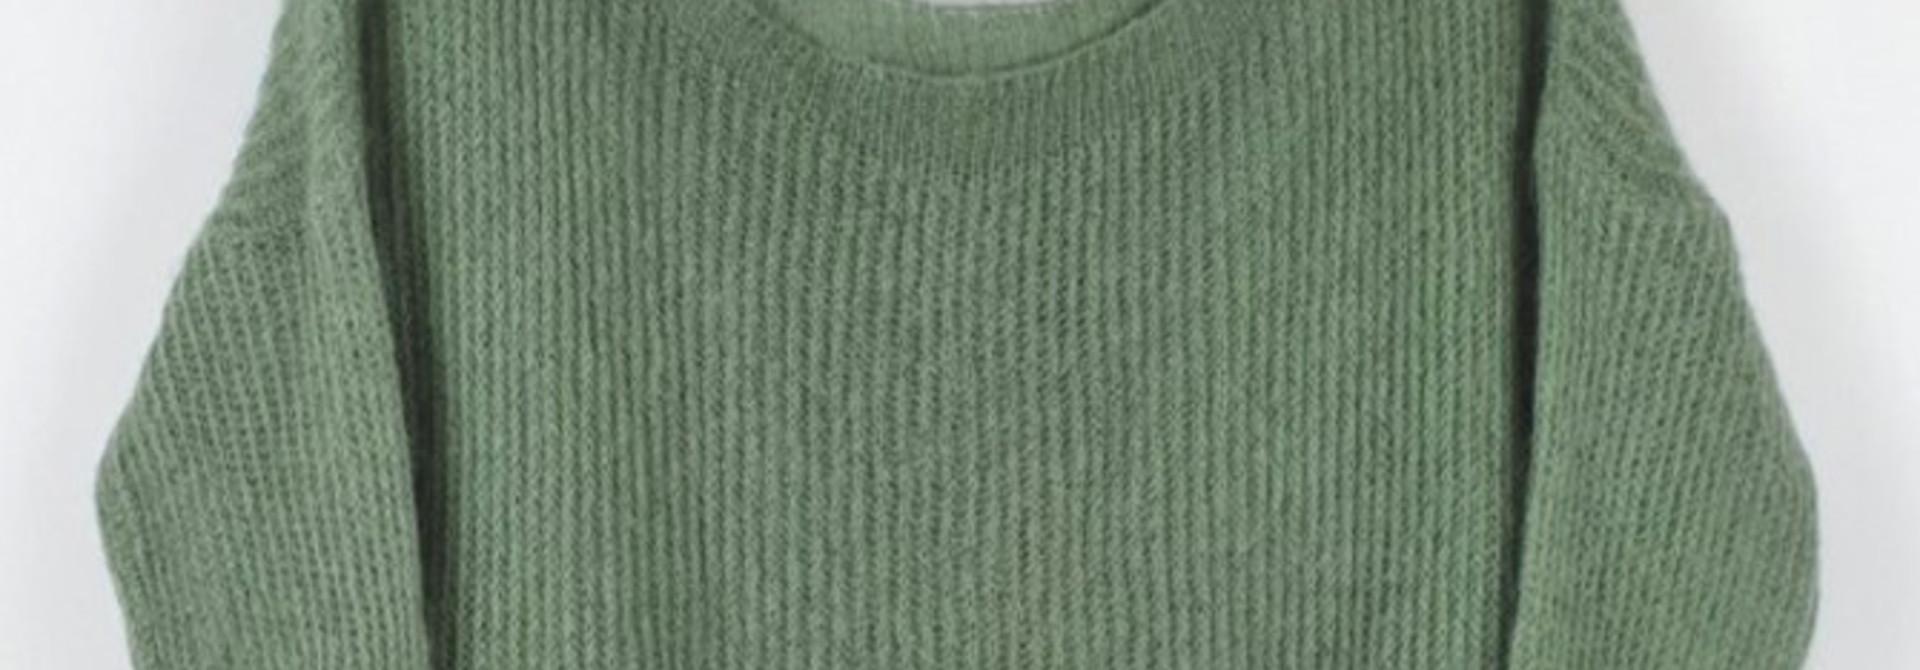 Felice fine knit Advocado